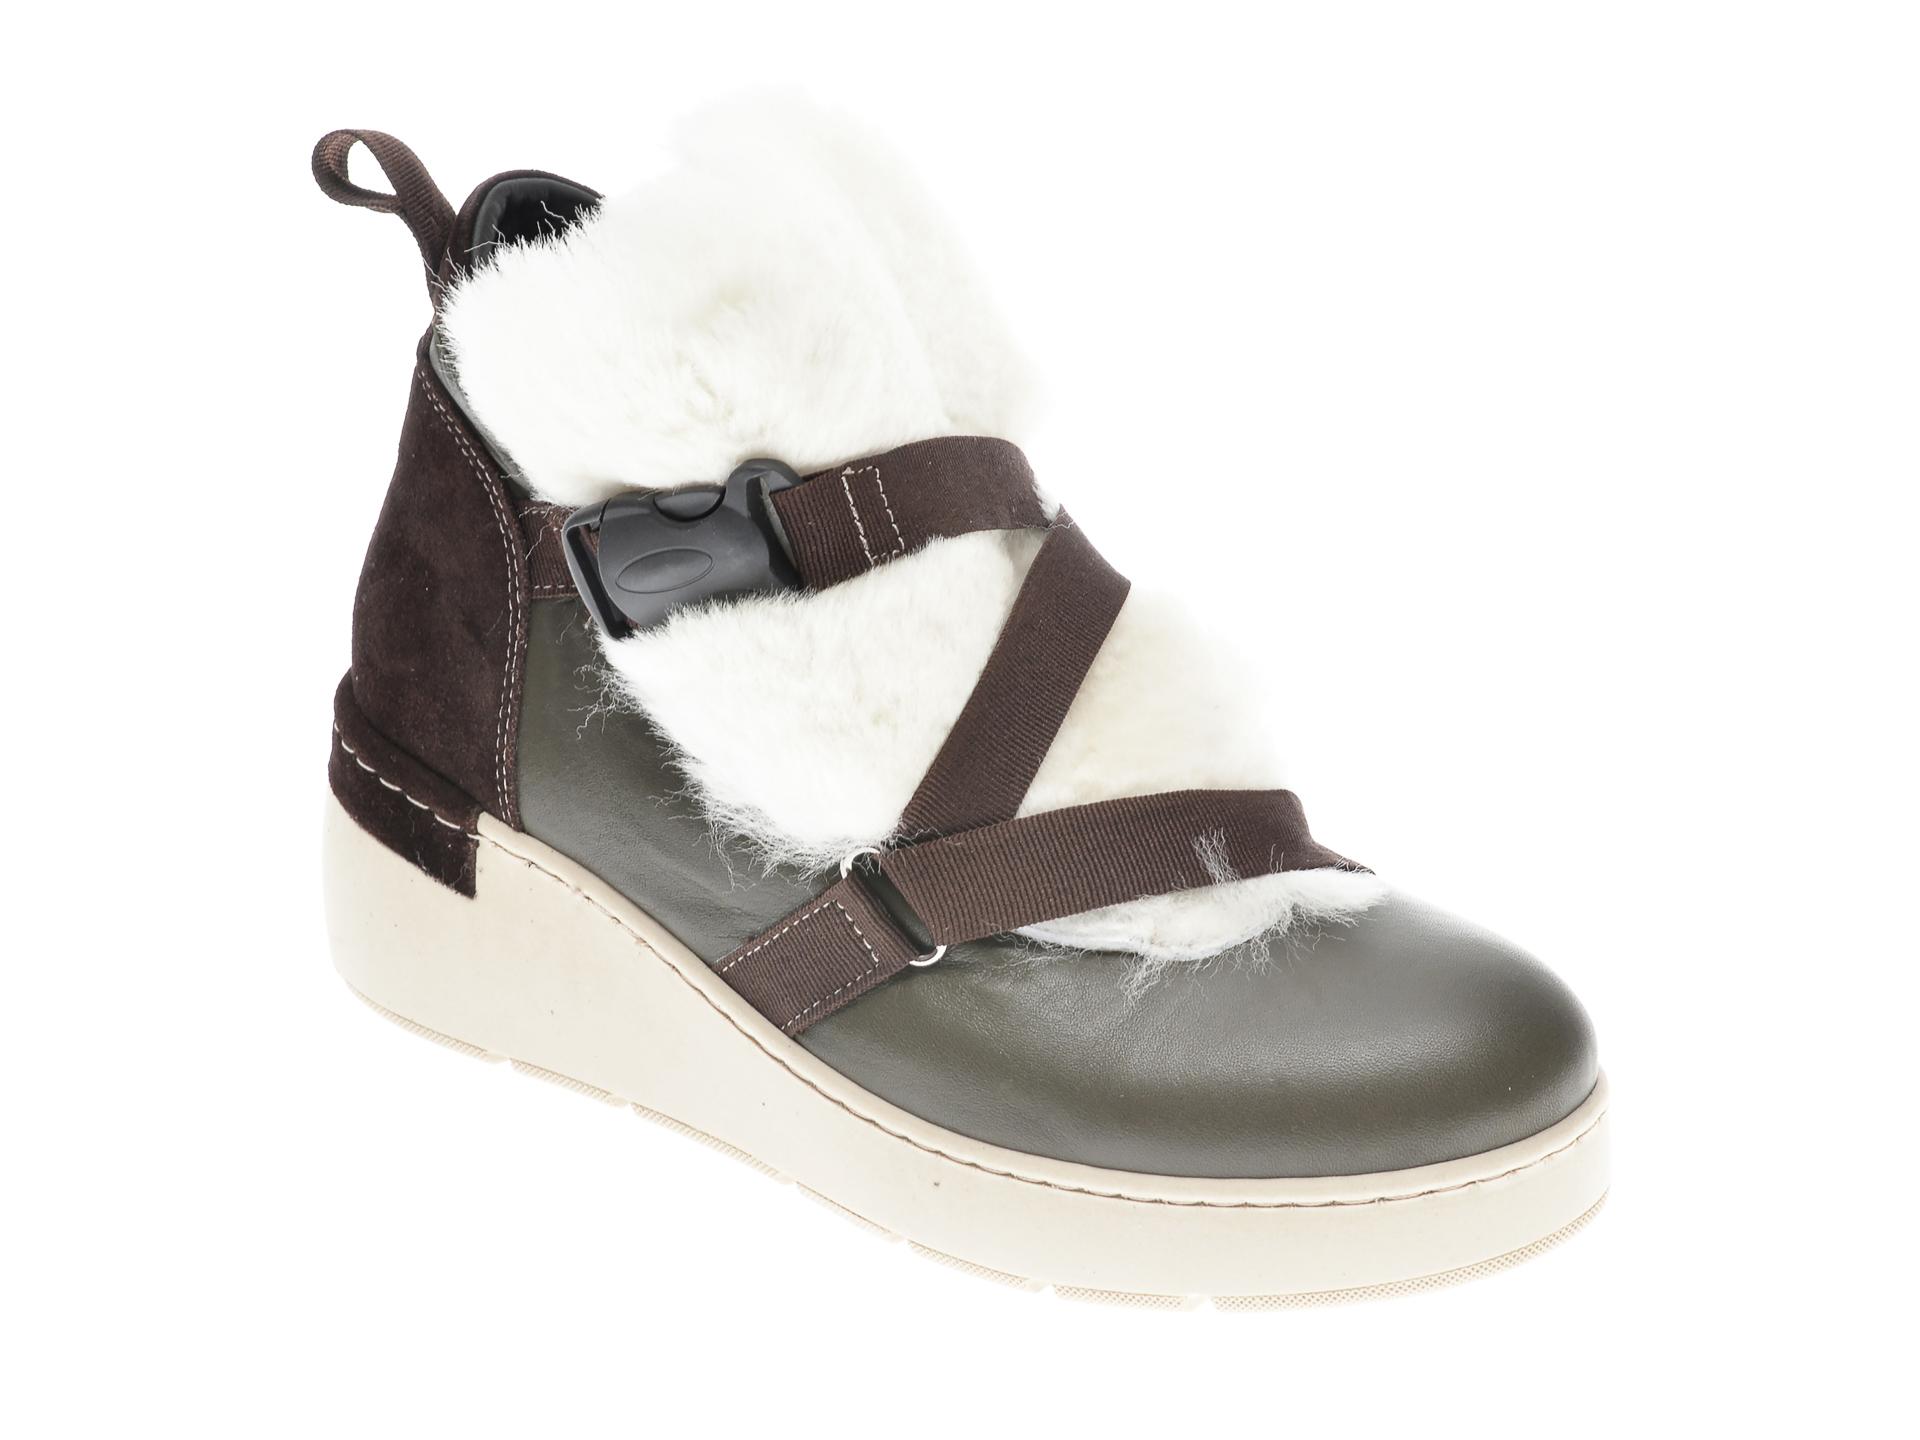 Ghete FLAVIA PASSINI kaki, 1047, din piele naturala imagine